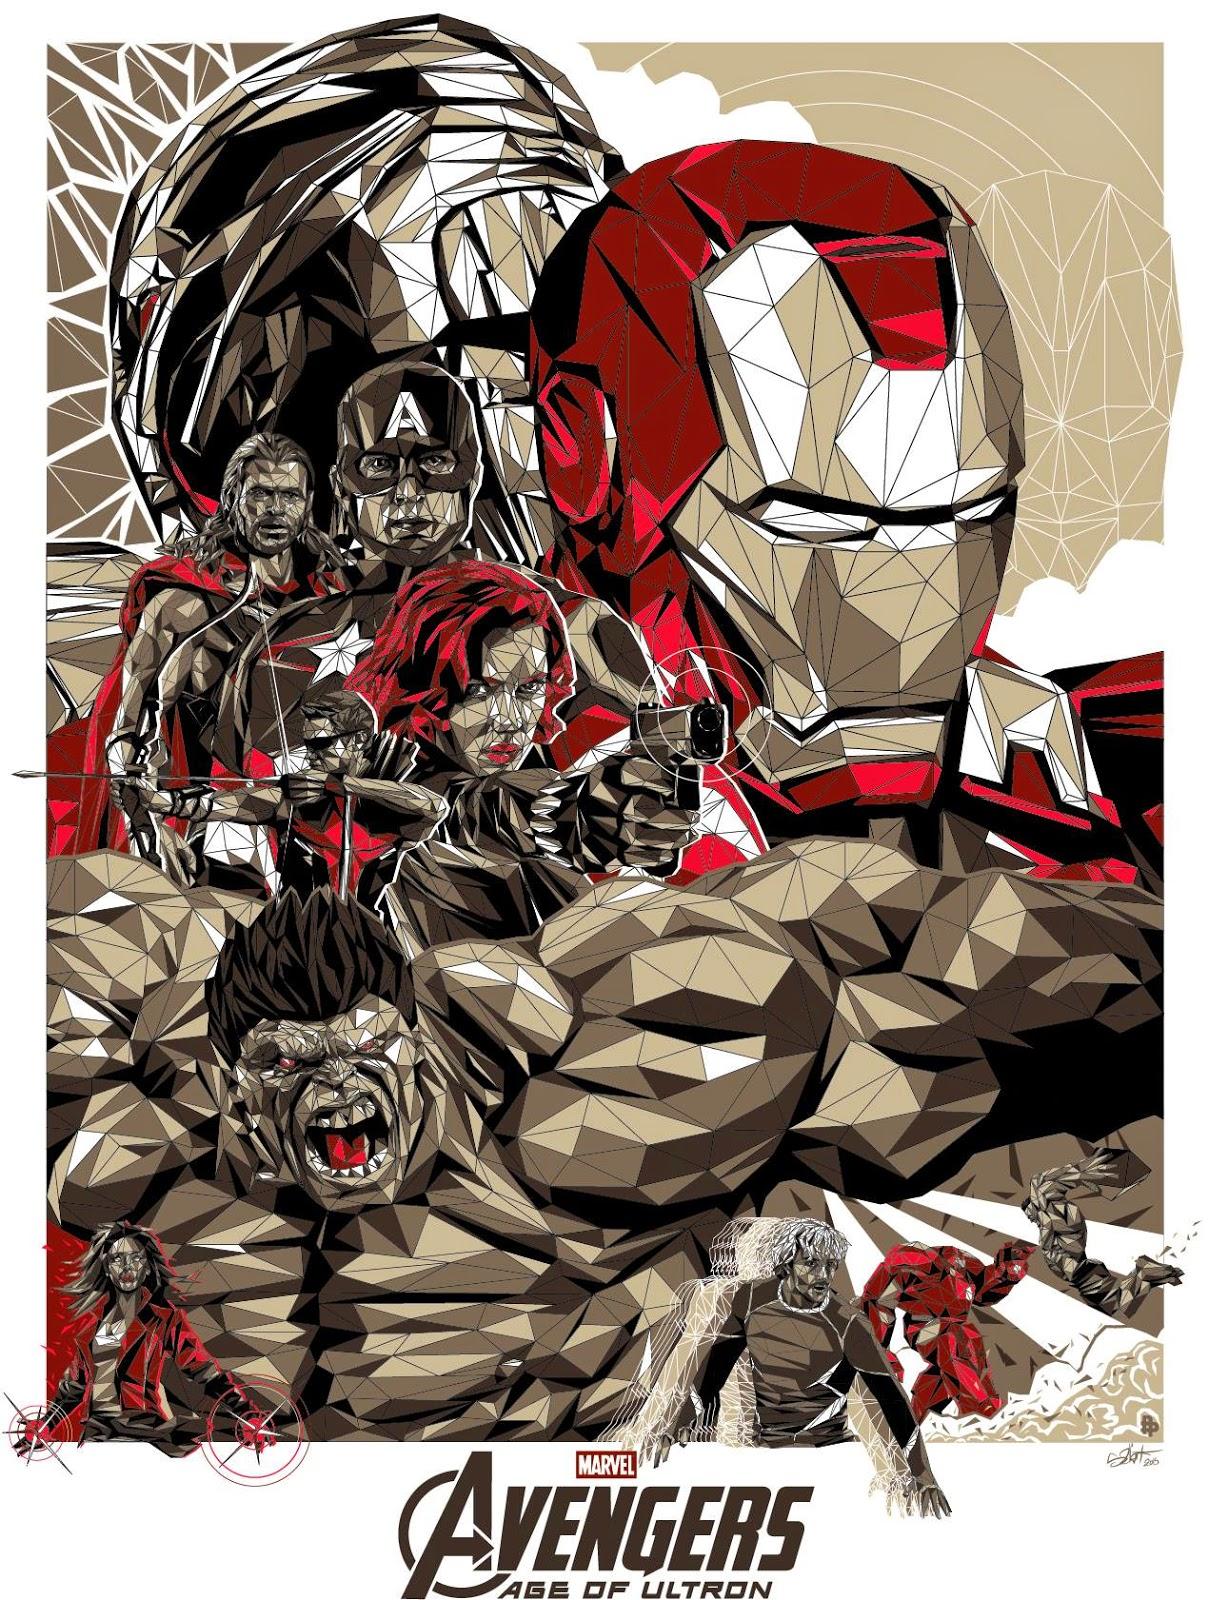 Avengers Age of Ultron Concept Art Cool Art 39 Avengers Age of